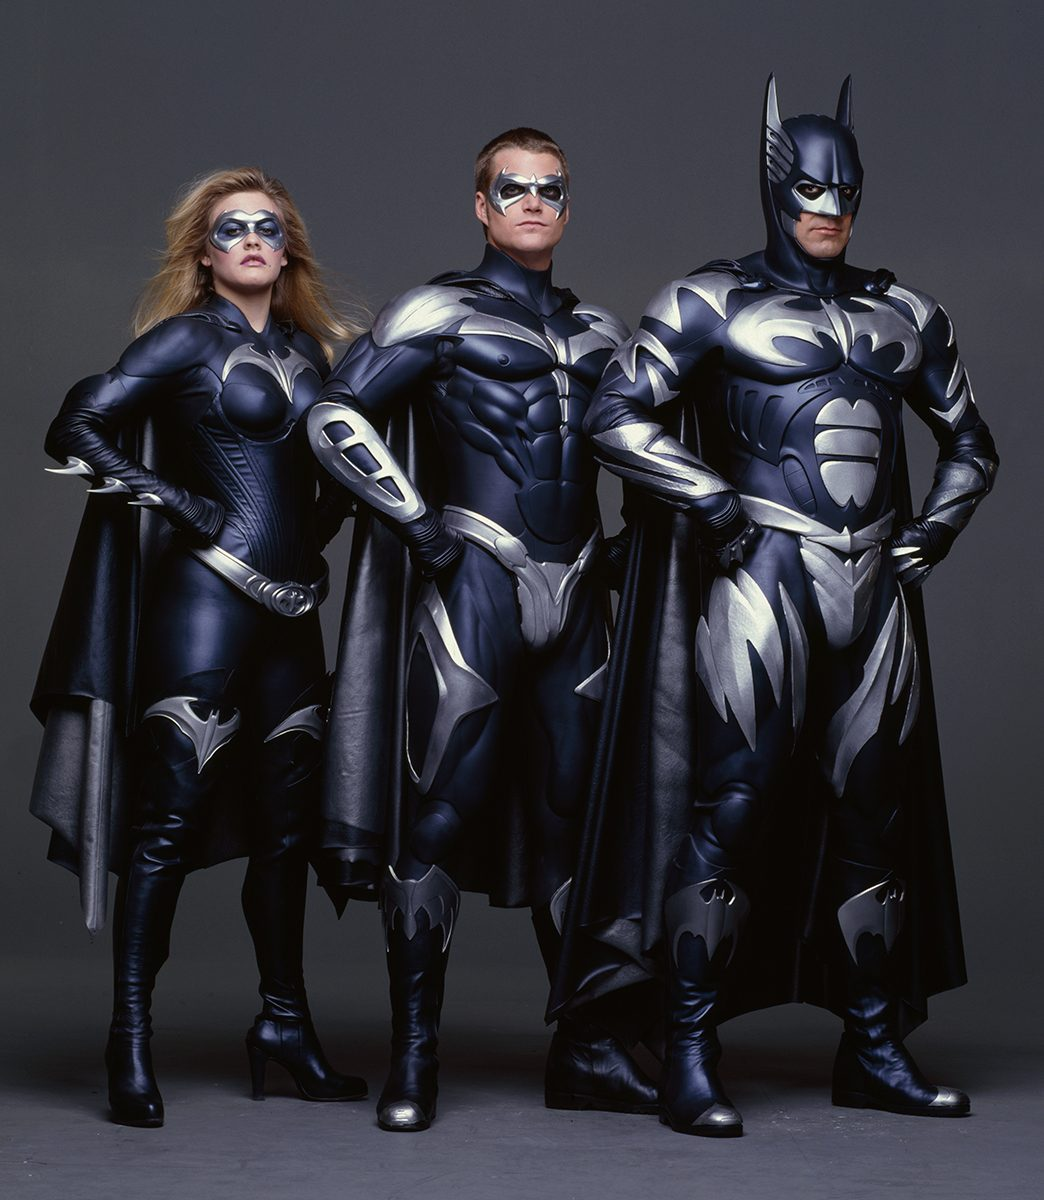 http://vignette2.wikia.nocookie.net/batman/images/3/3b/BatmanRobinGroup1.jpg/revision/latest?cb=20101215233109